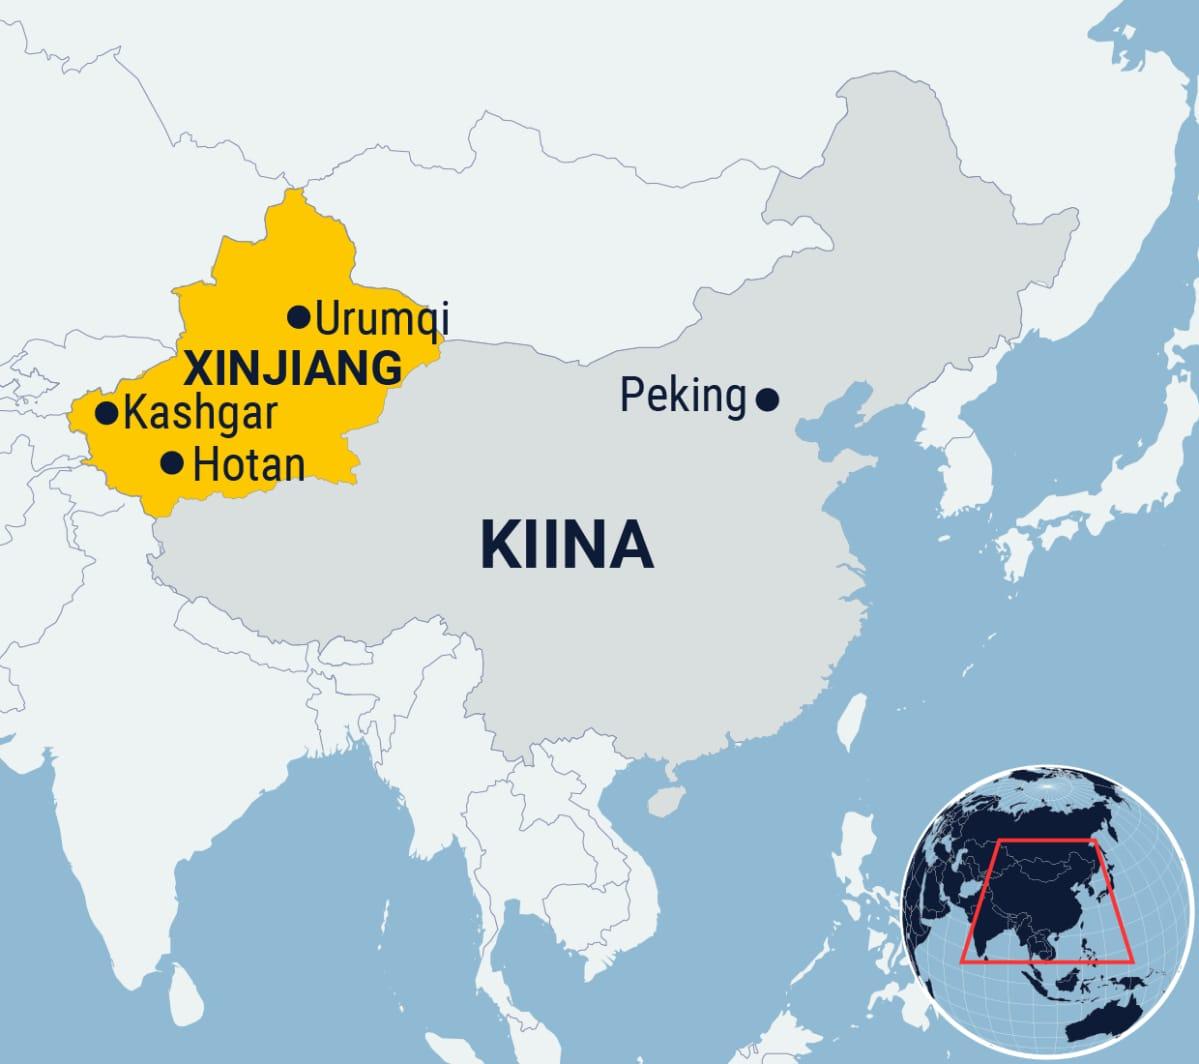 Kartta Xianjiangin maakunnasta Kiinassa.